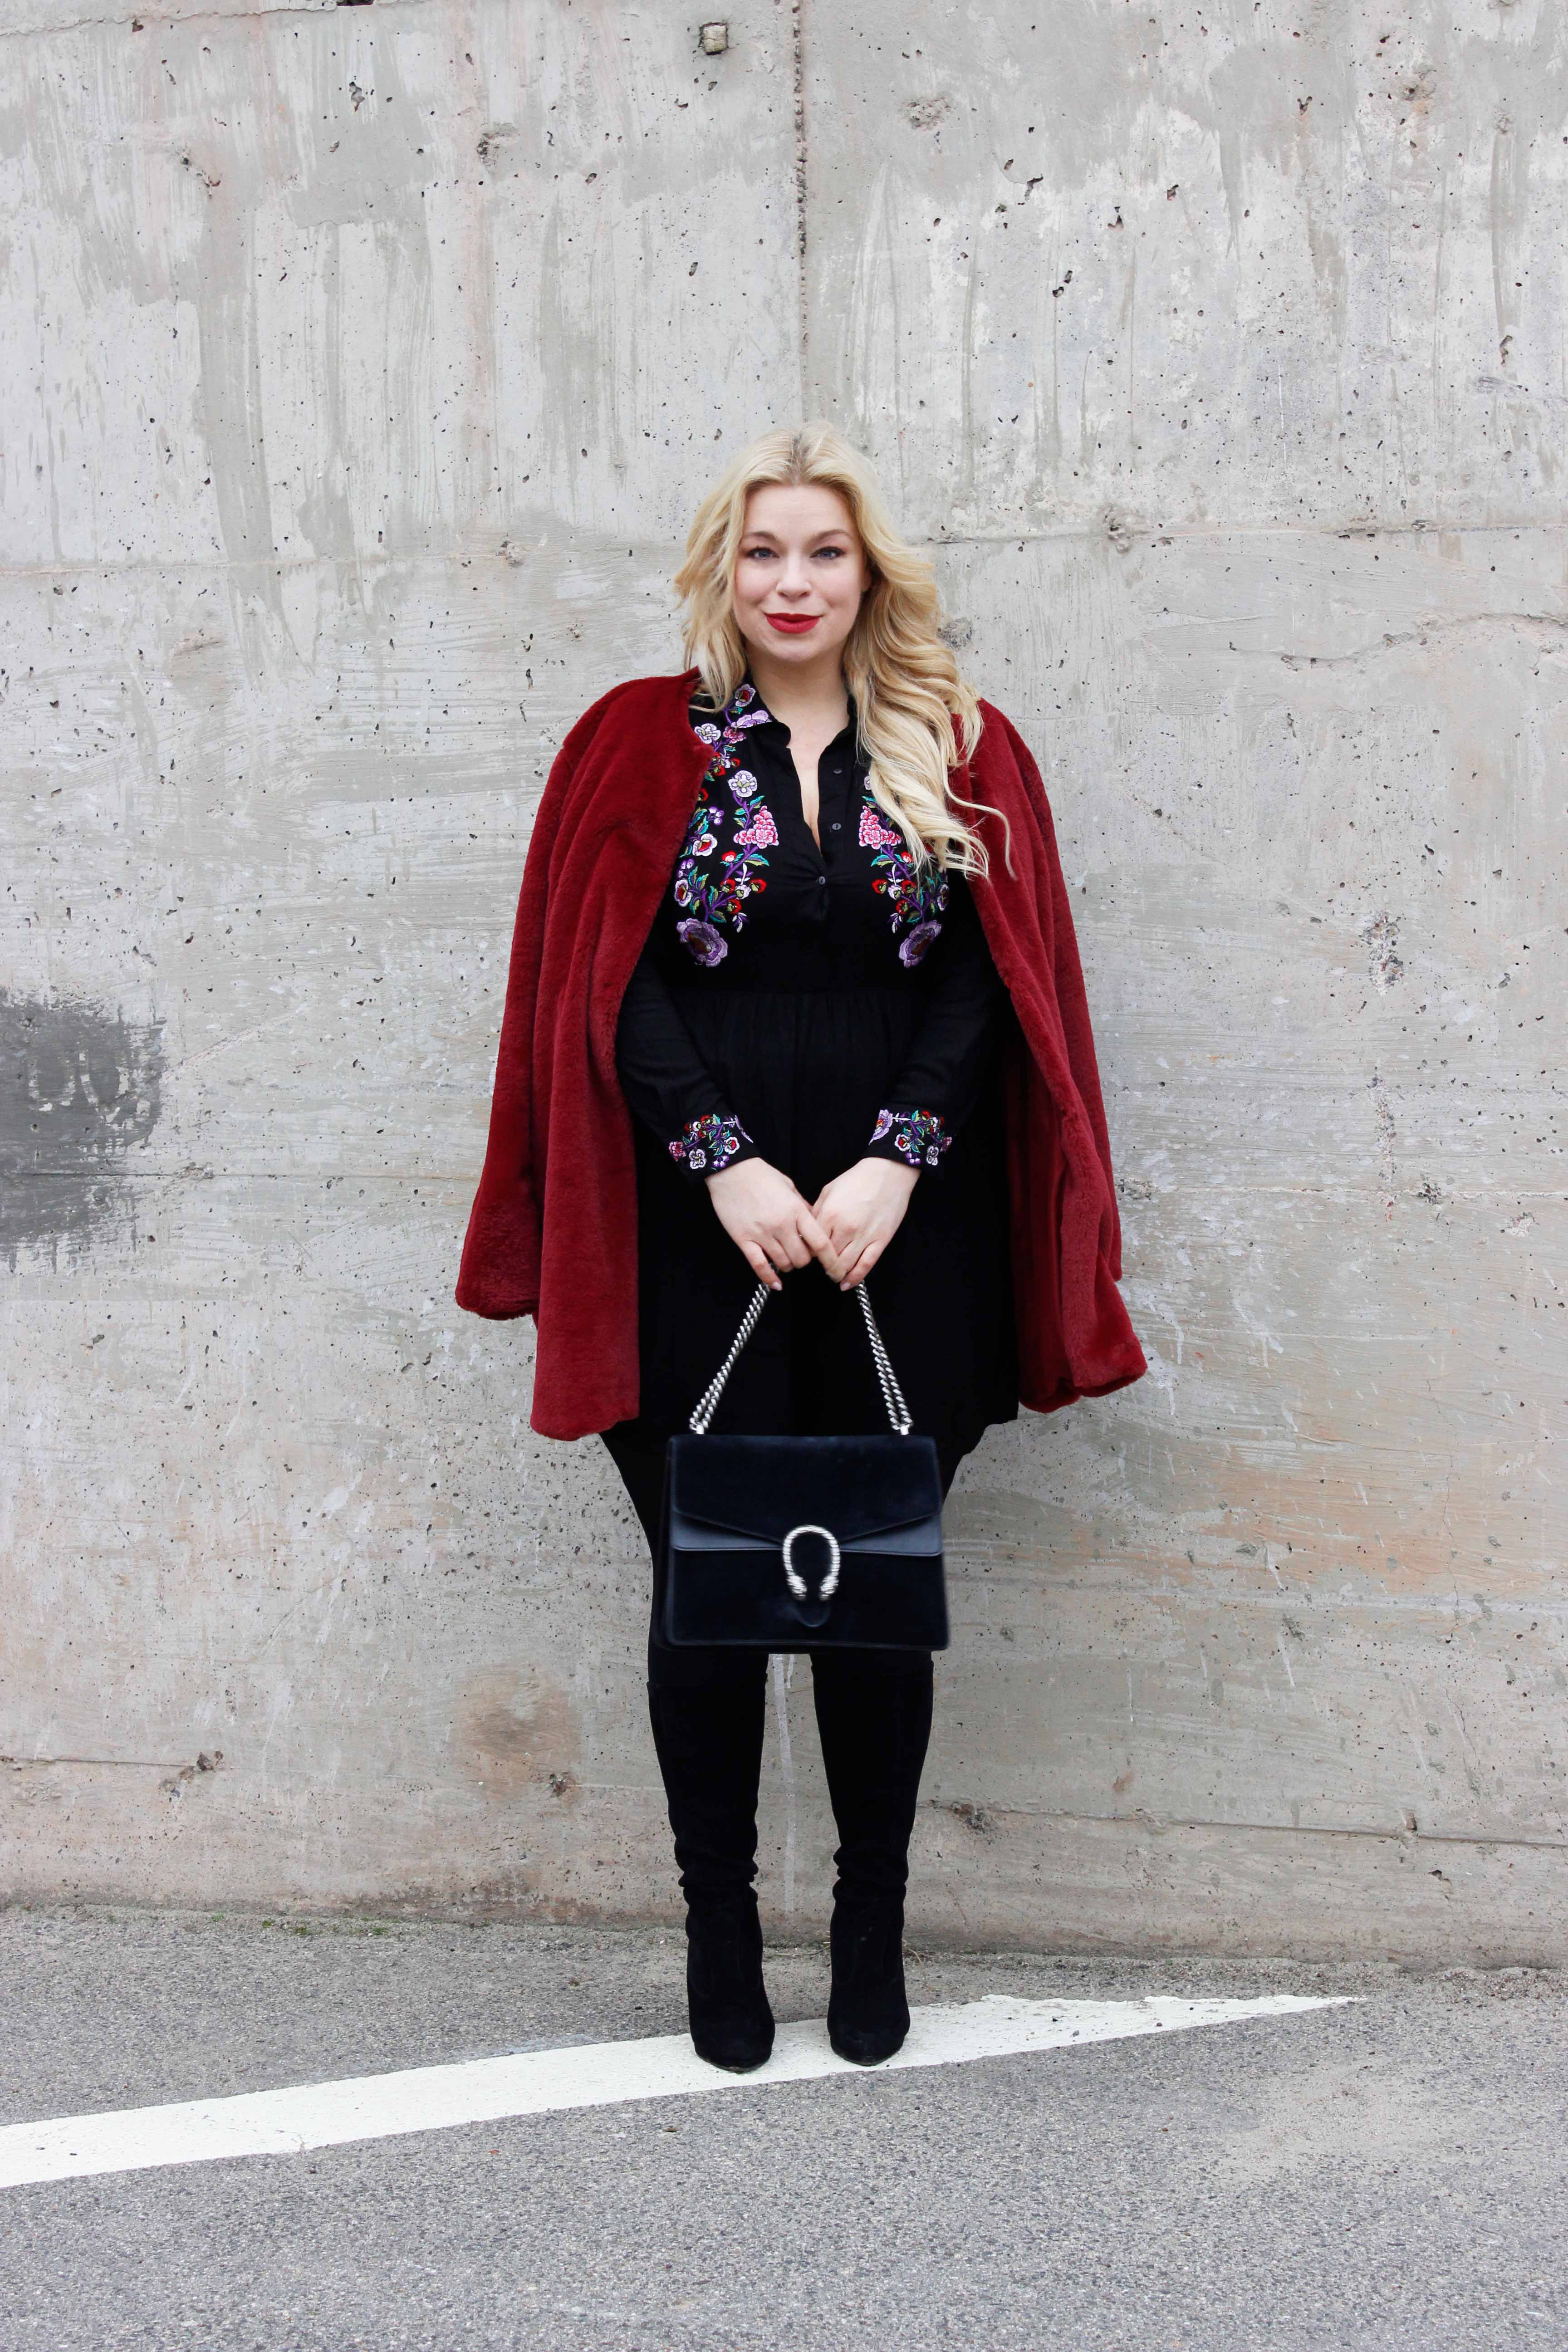 Megabambi-Caterina-pogorzelski-wunderccurves-Plussize-Gucci